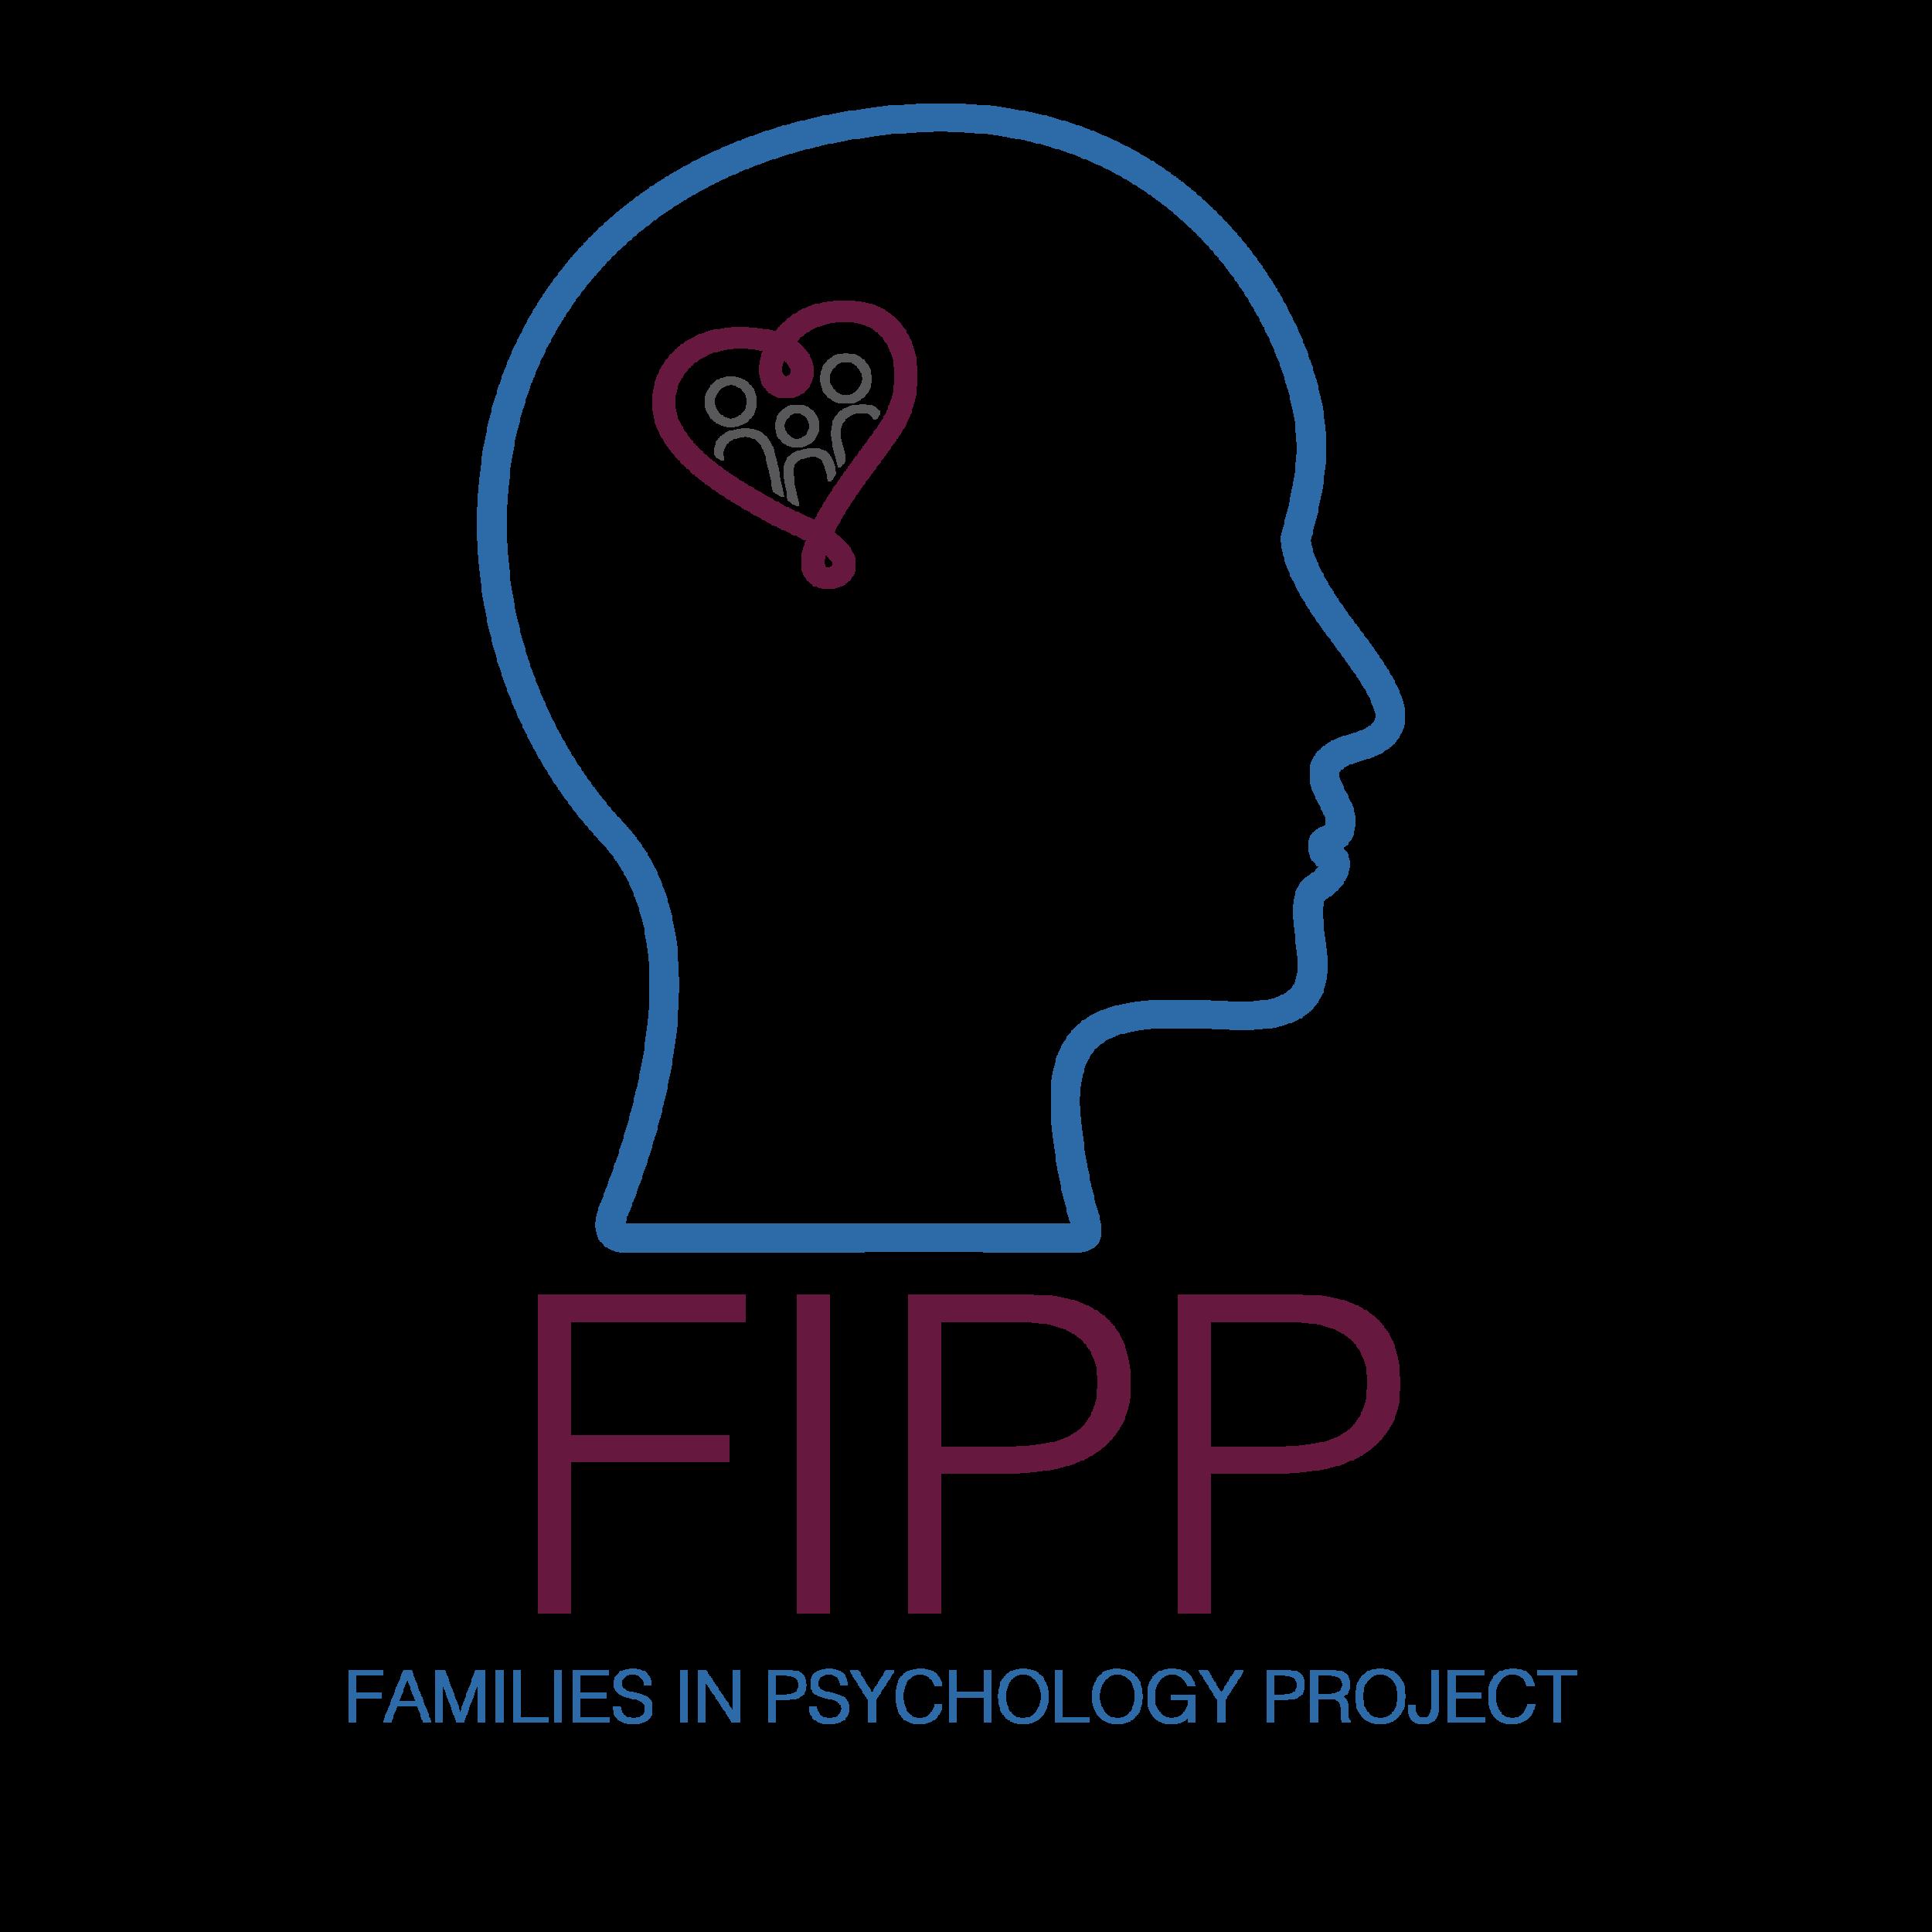 10.29.18_FIPP_logo_web.png